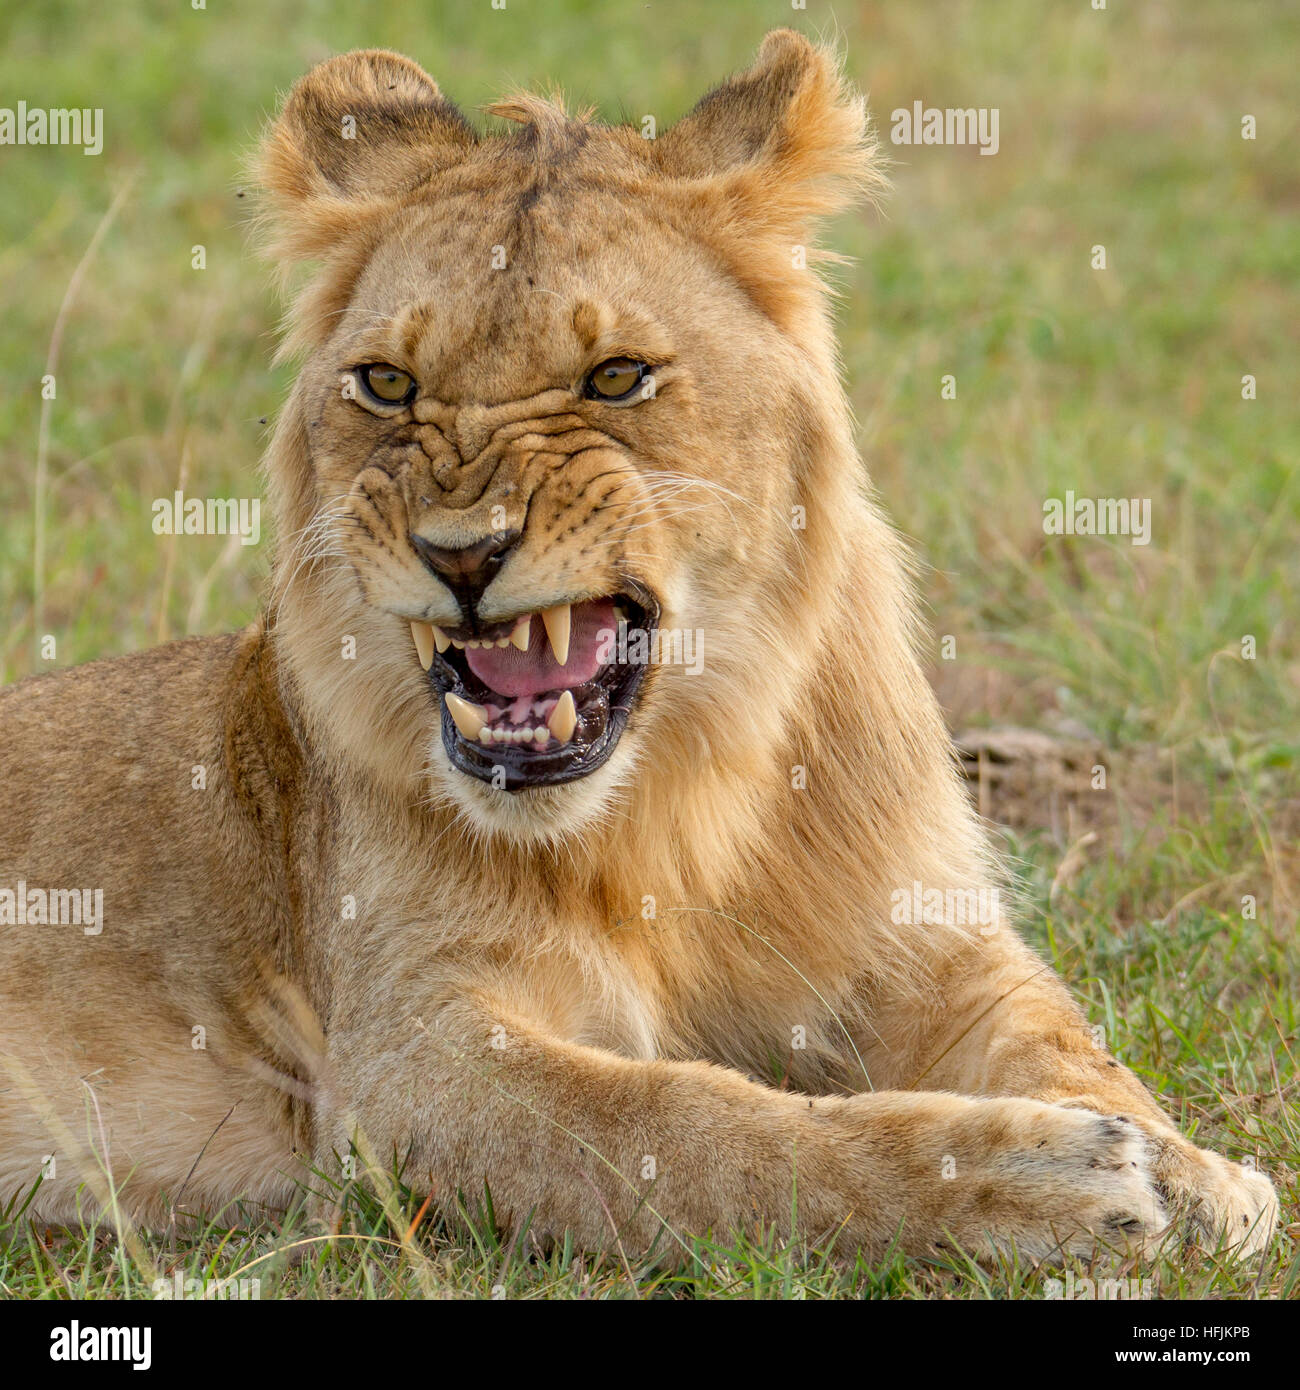 young male lion snarling, close, Mara Naboisho Conservancy Kenya Africa - Stock Image